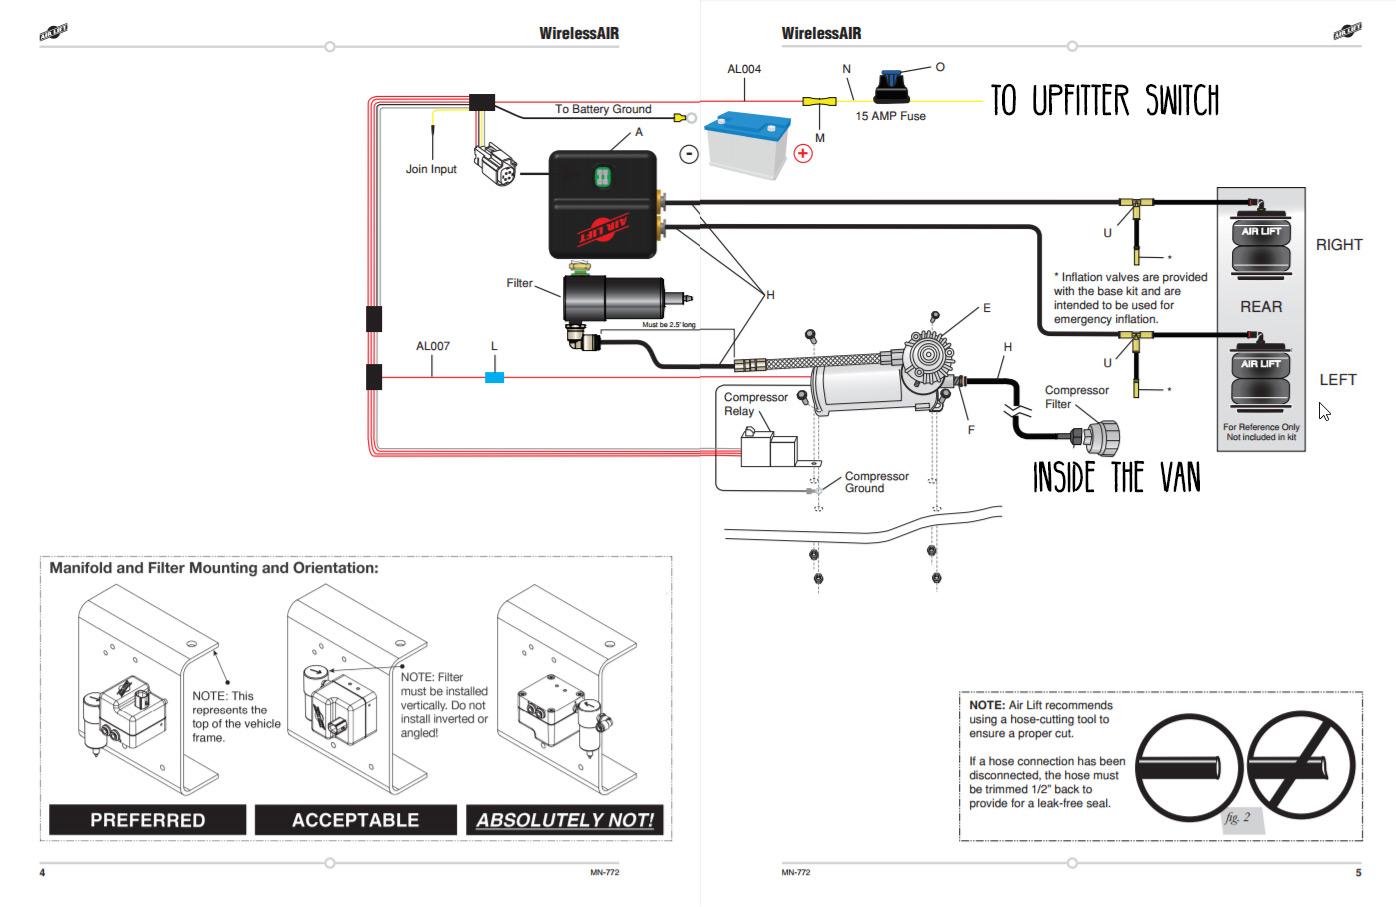 vl_7300] air lift suspension wiring diagram download diagram  knie ginia junap mohammedshrine librar wiring 101